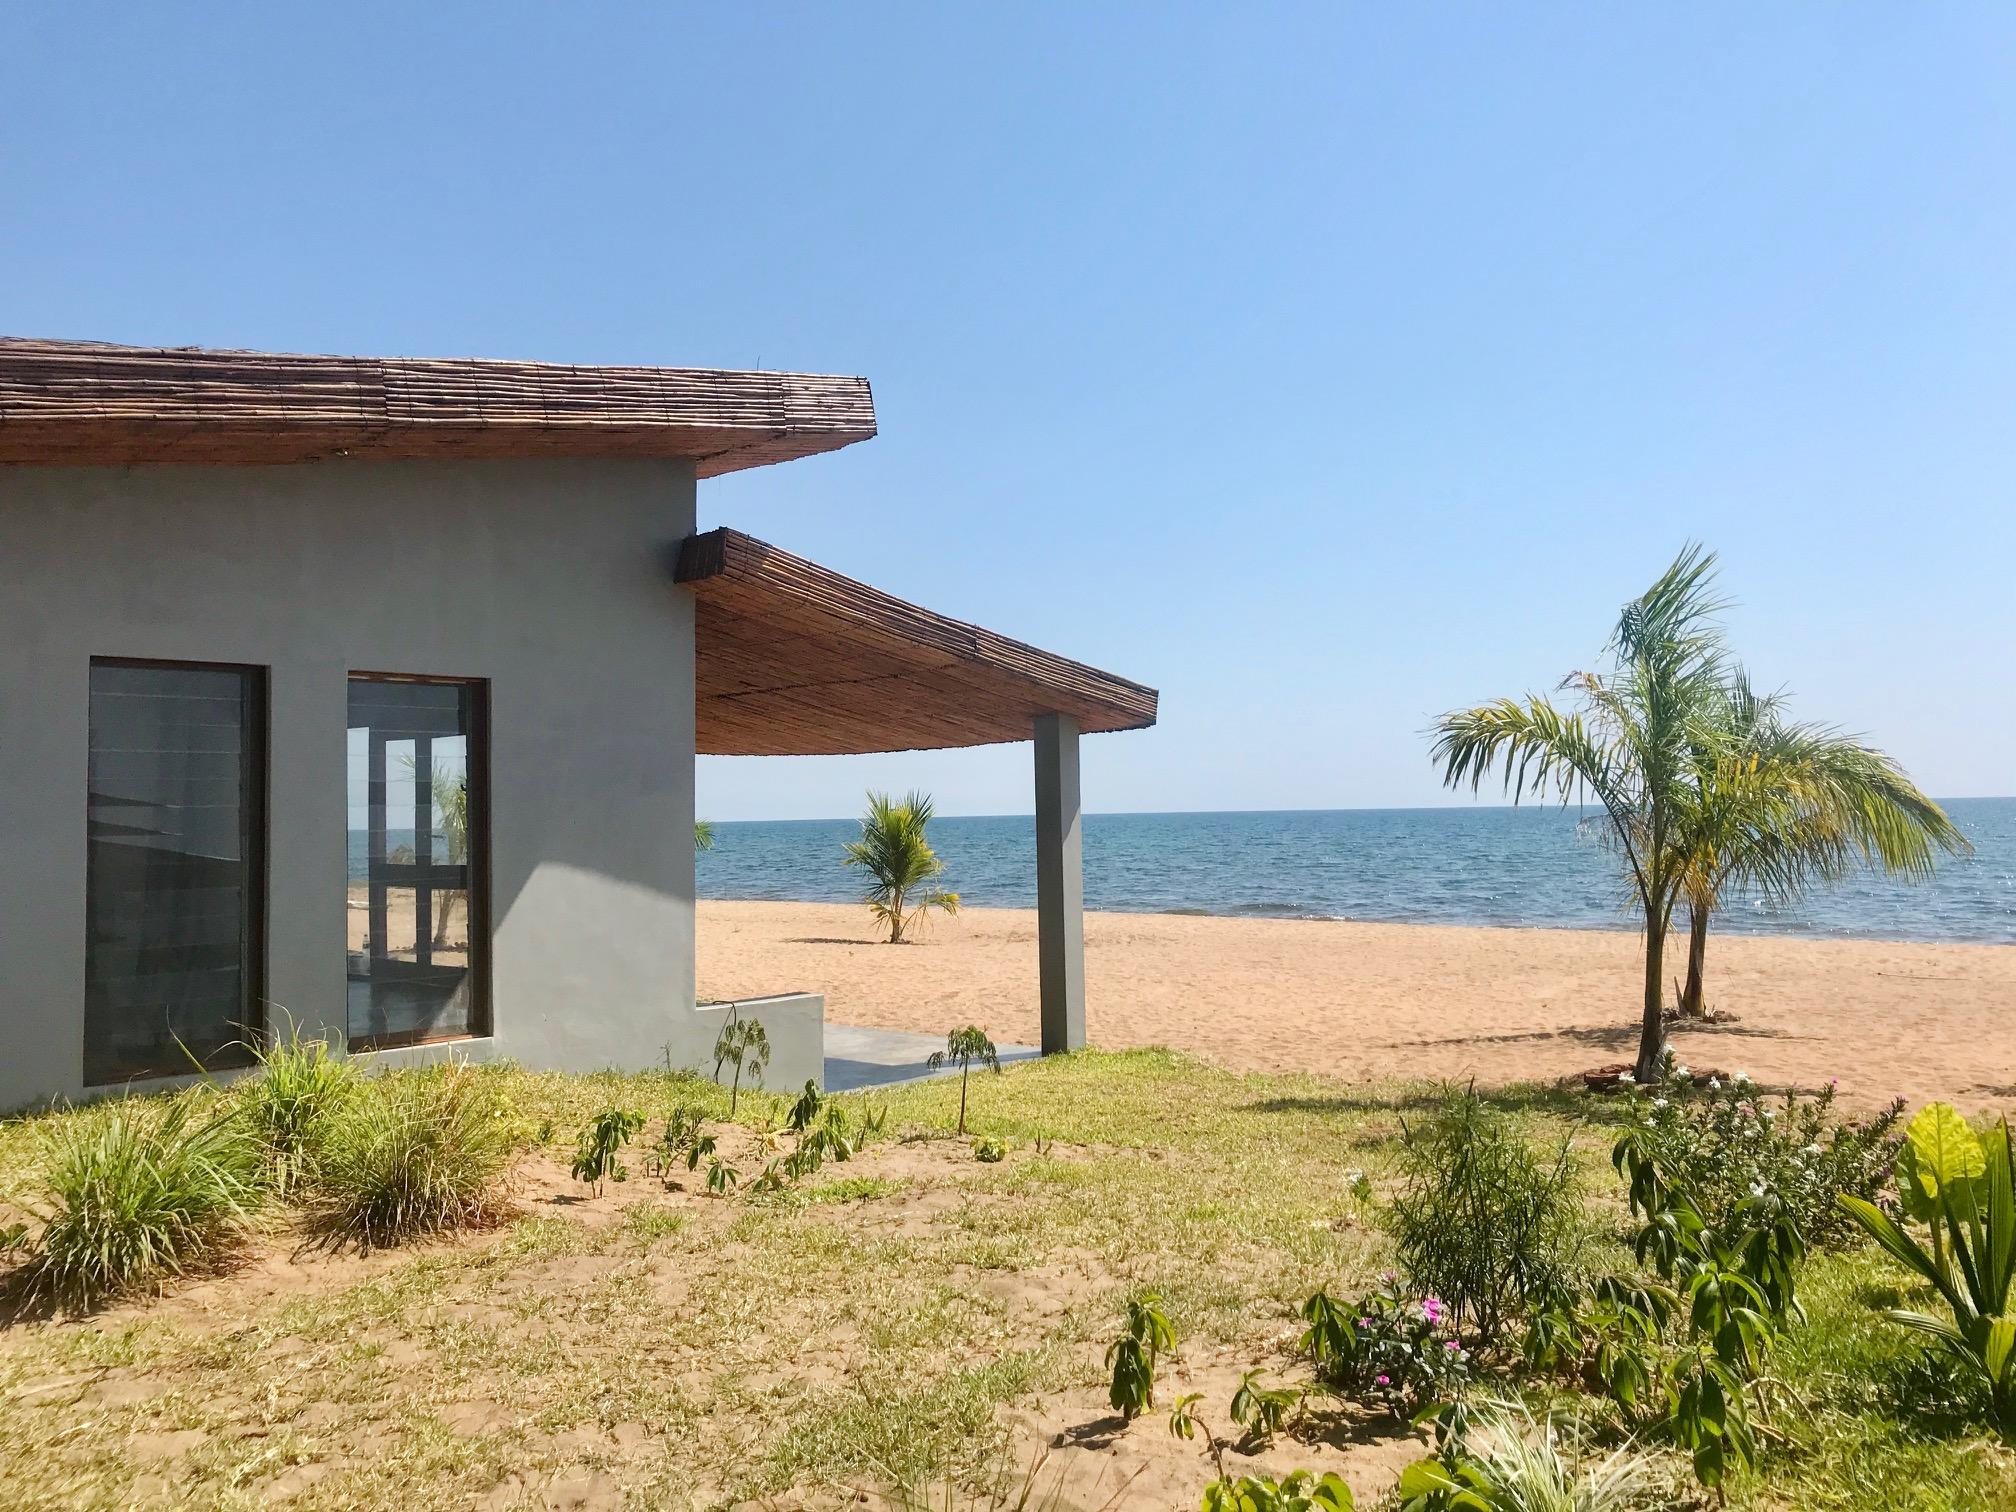 Lodge at Lake Malawi